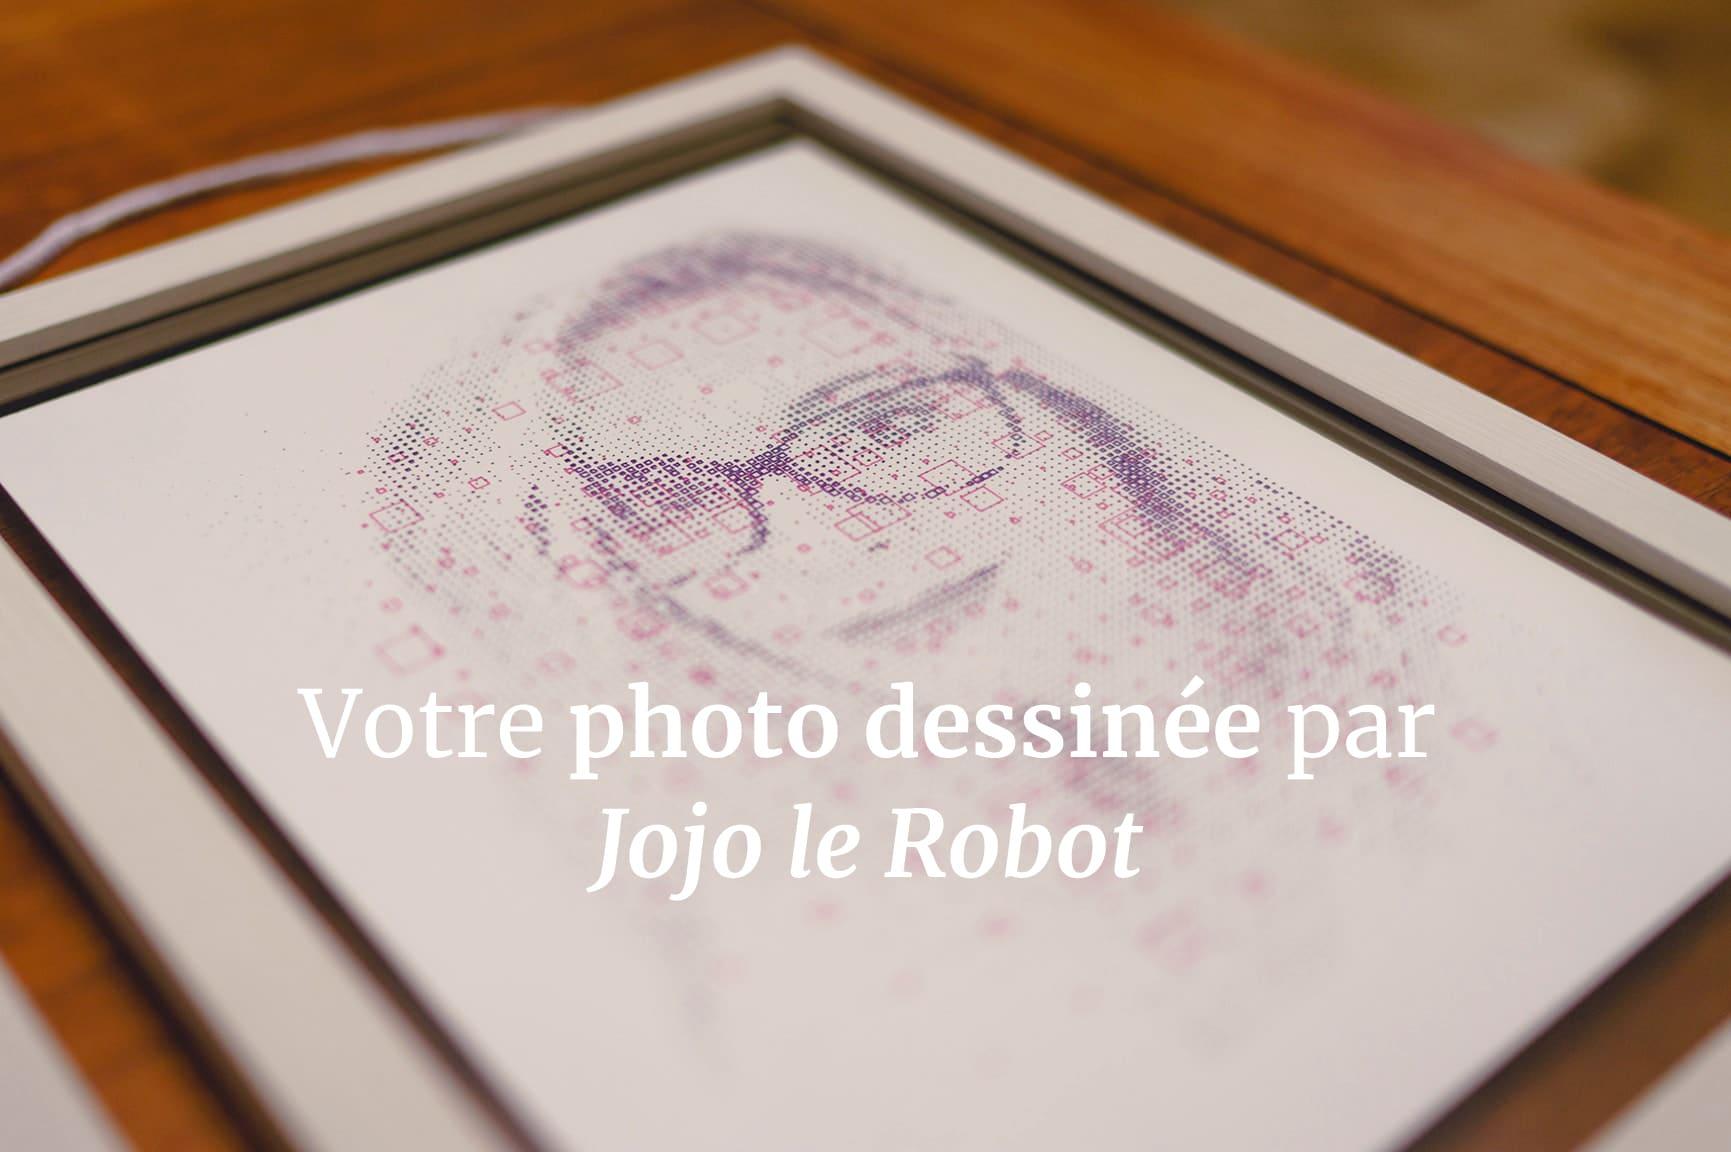 Plotter art portrait drawn by Jojo the robot